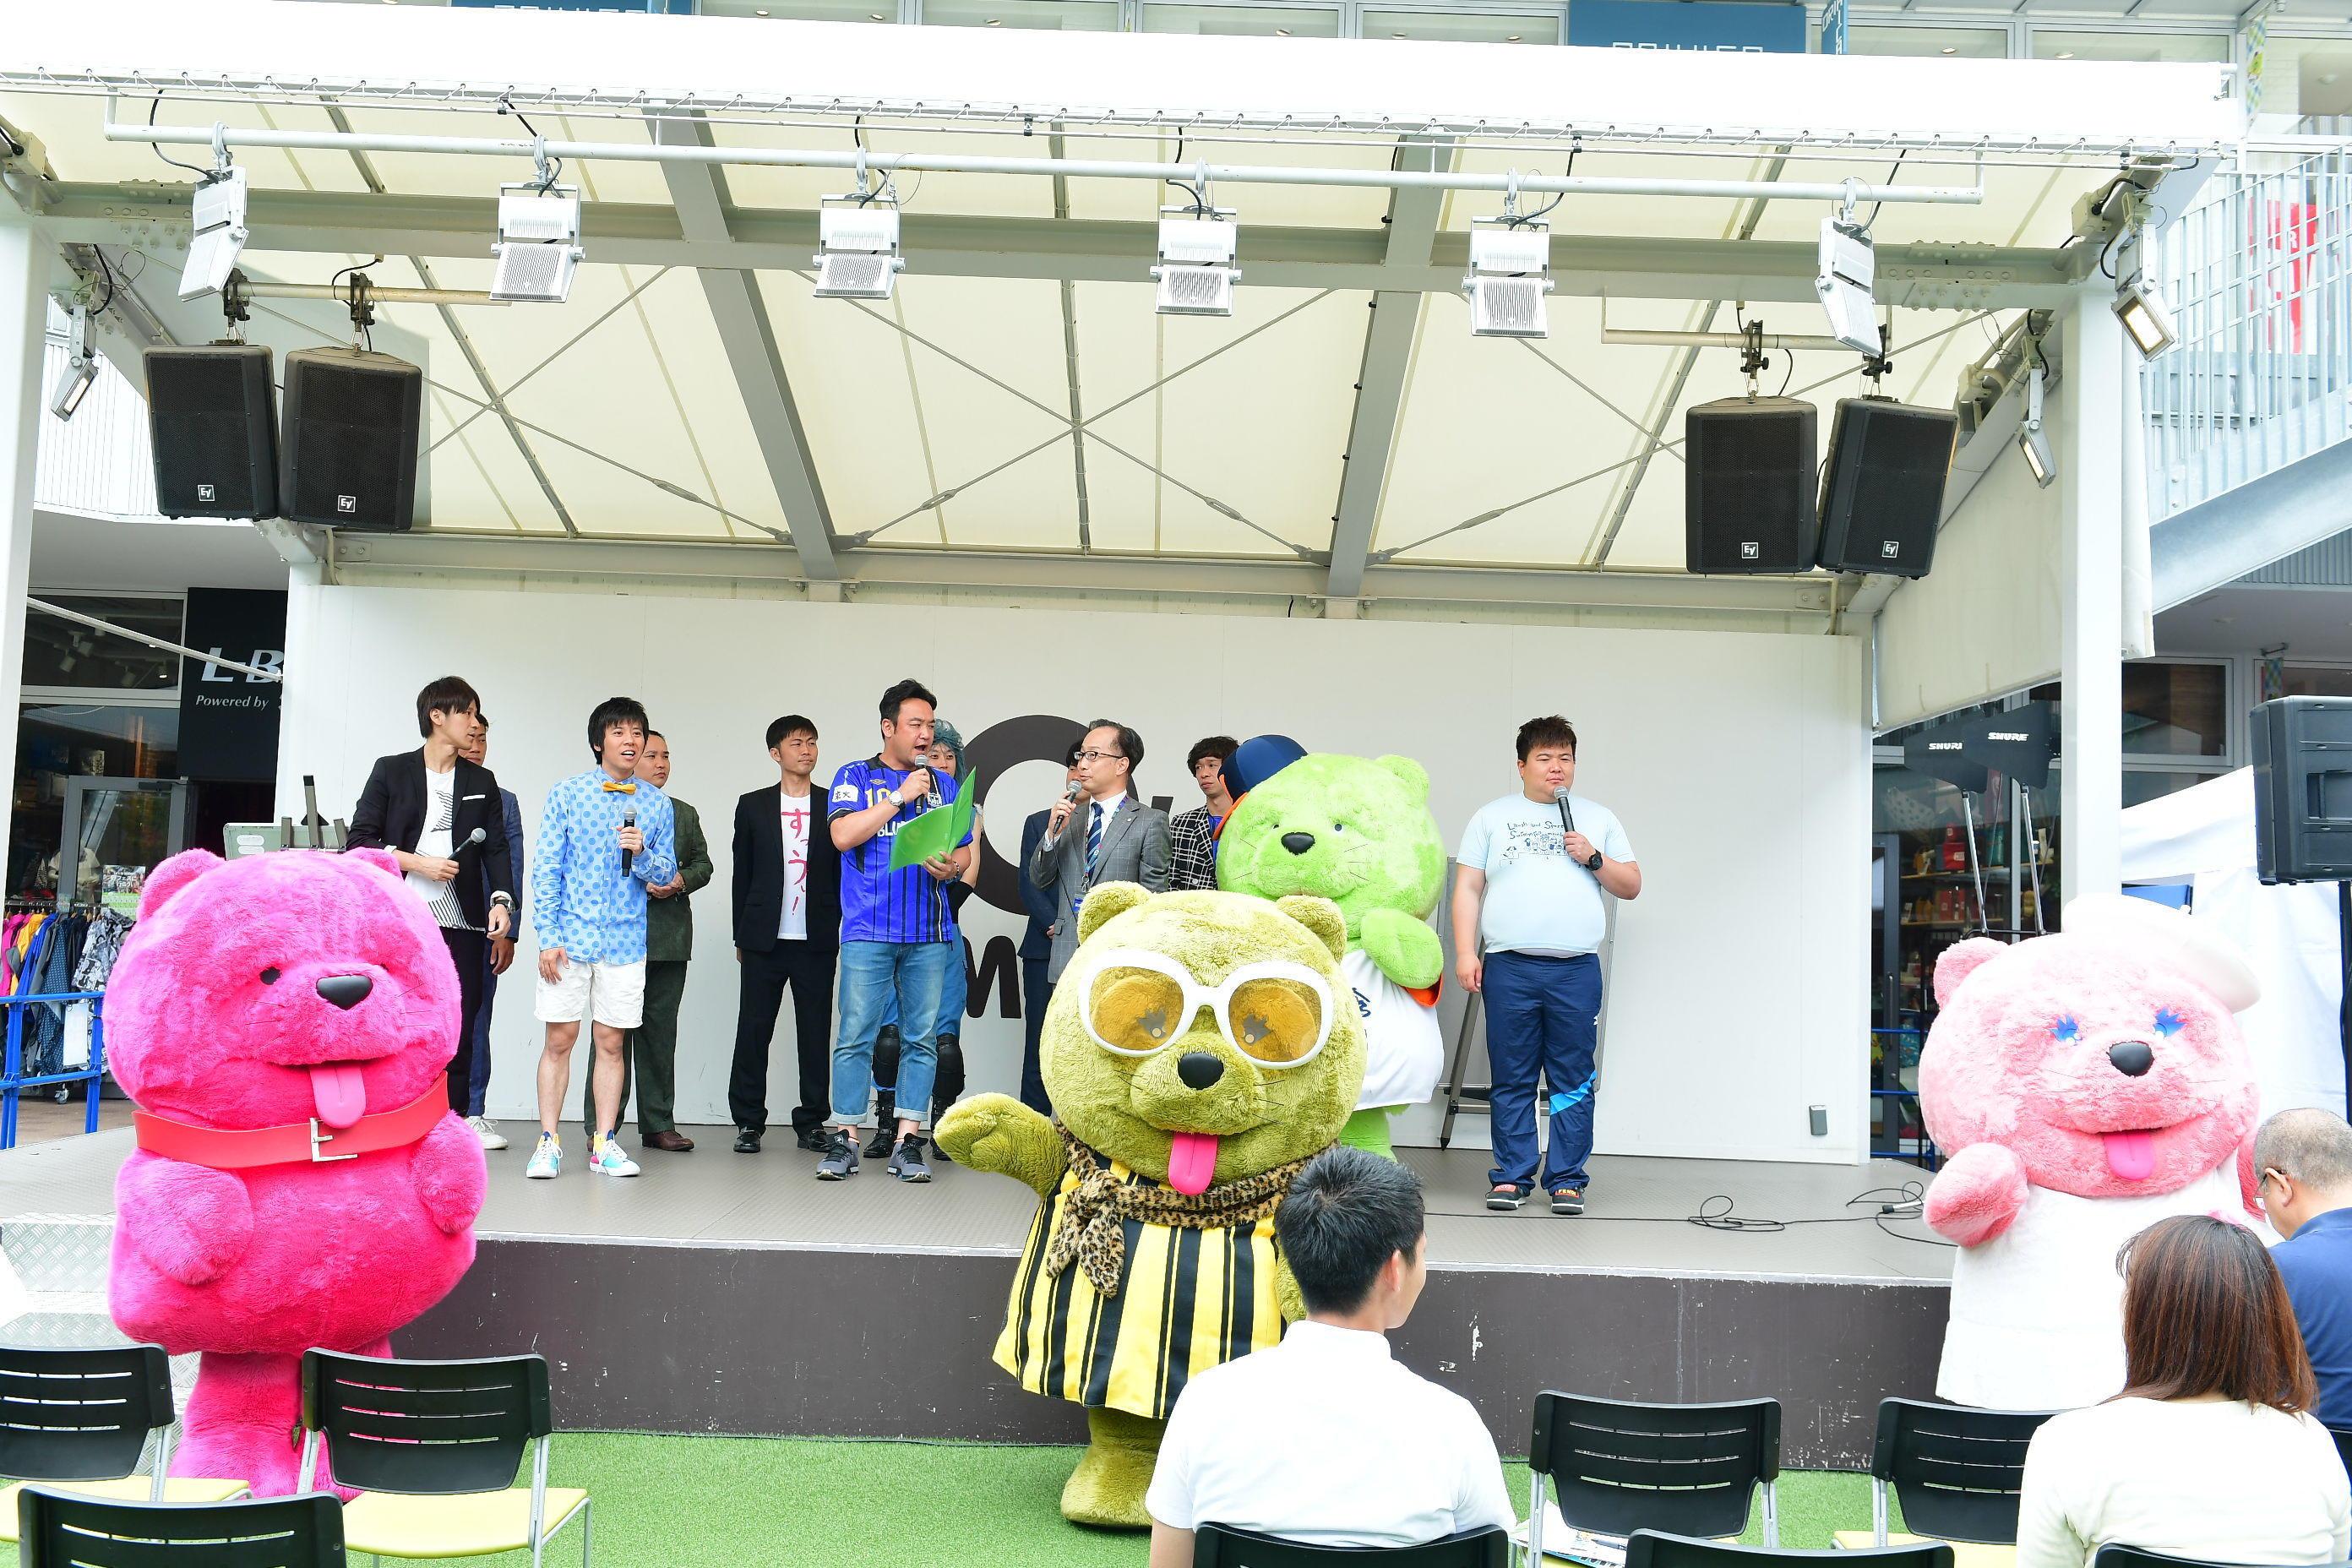 http://news.yoshimoto.co.jp/20180611143734-87ab655914335bb71dead3b833abdffe387bf4ee.jpg